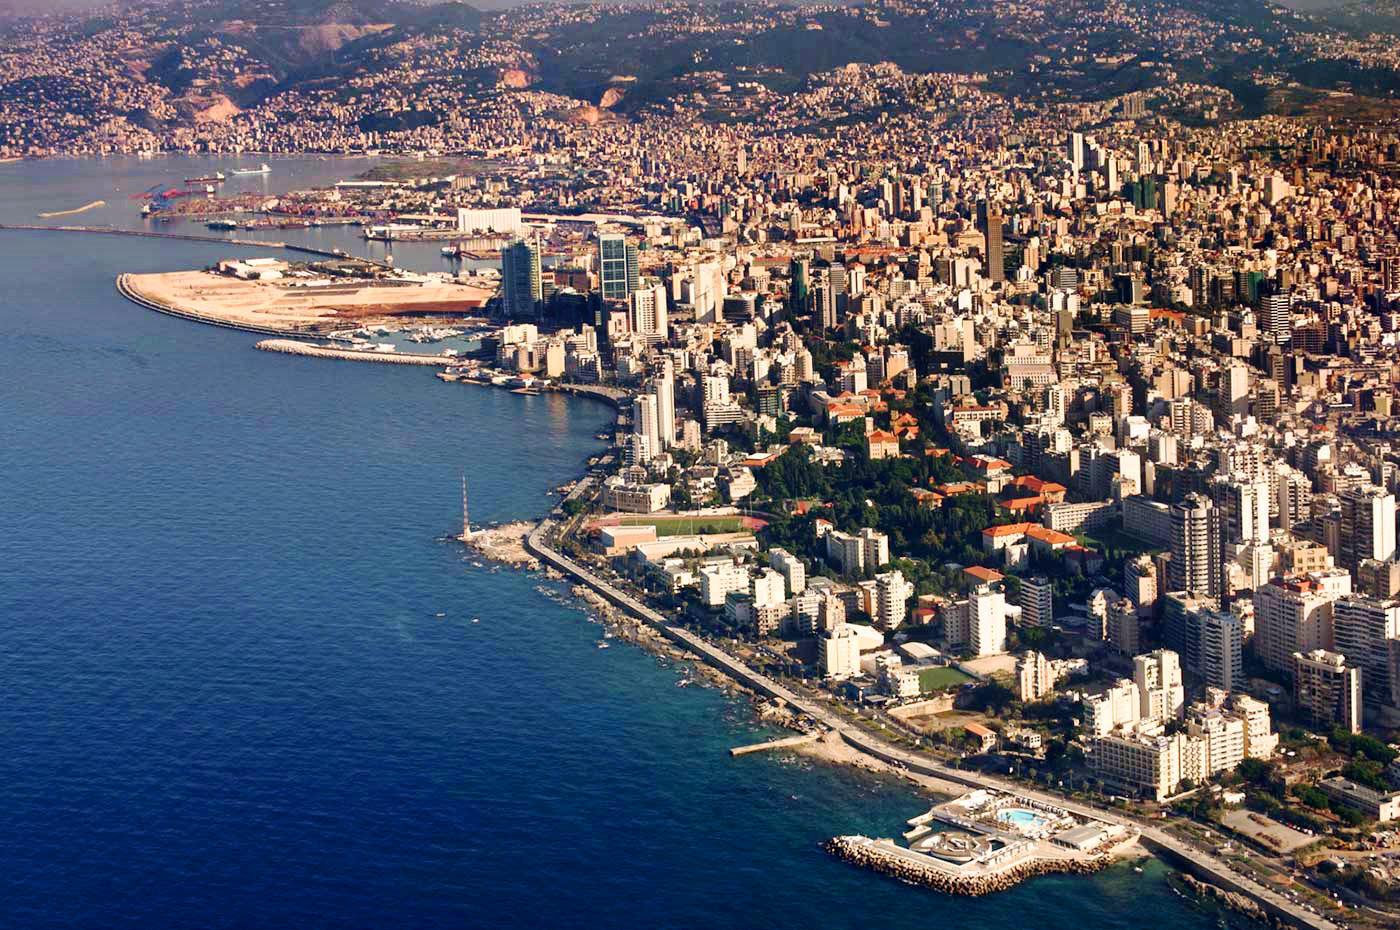 2977-so-liban-et-beyrouth-photo-01-fr.jpg